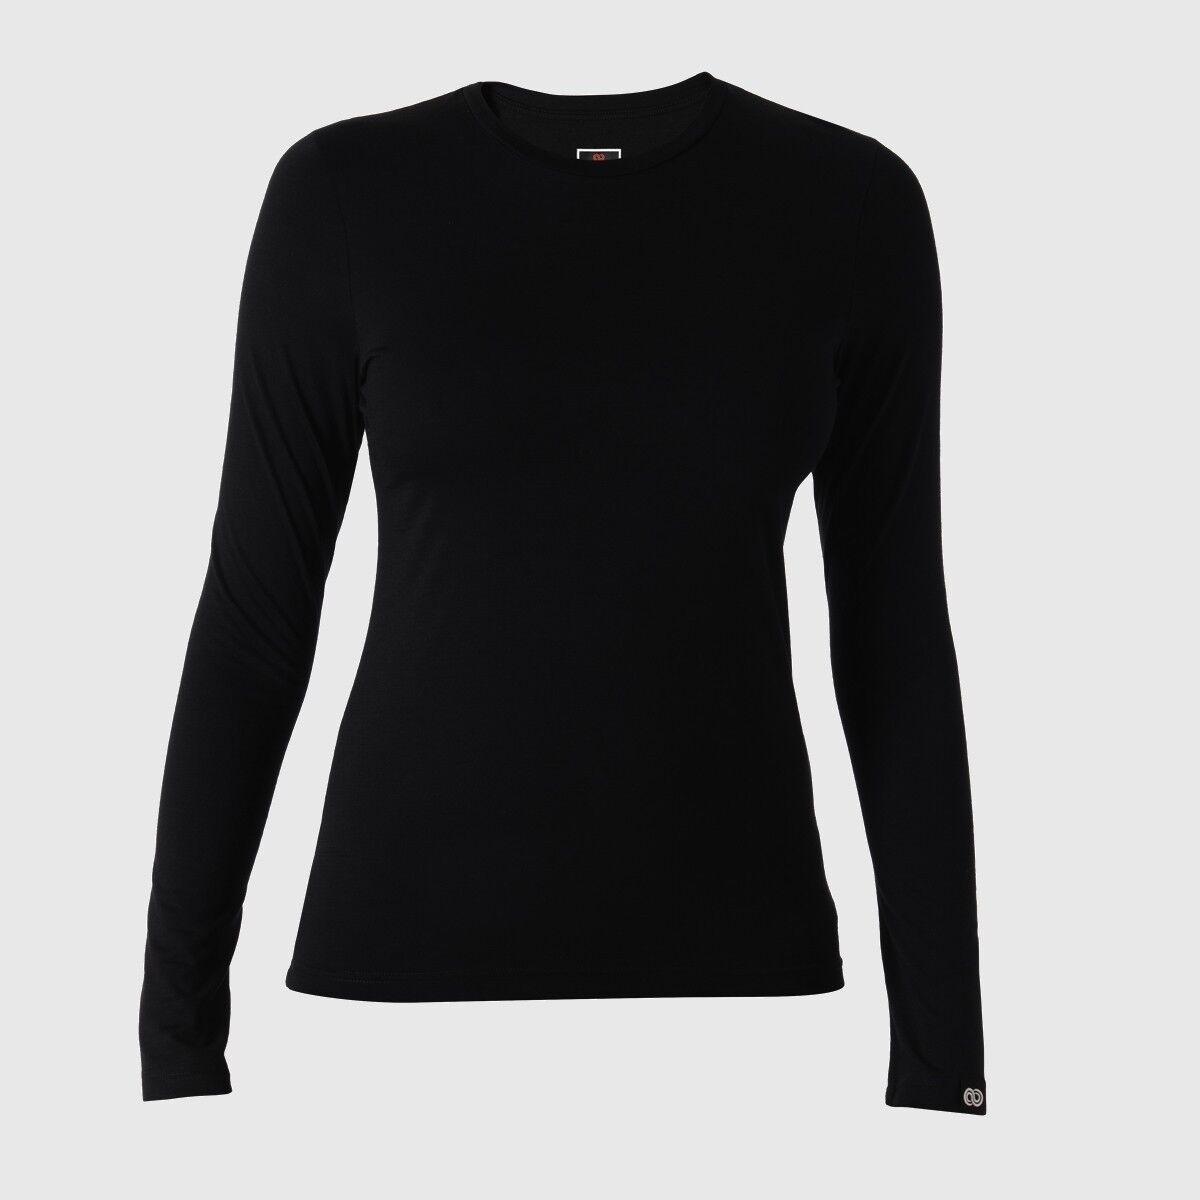 rotA Rewoolution Berry  damen T-Shirt Long Sleeve 140  schwarz Merinowolle Gr L